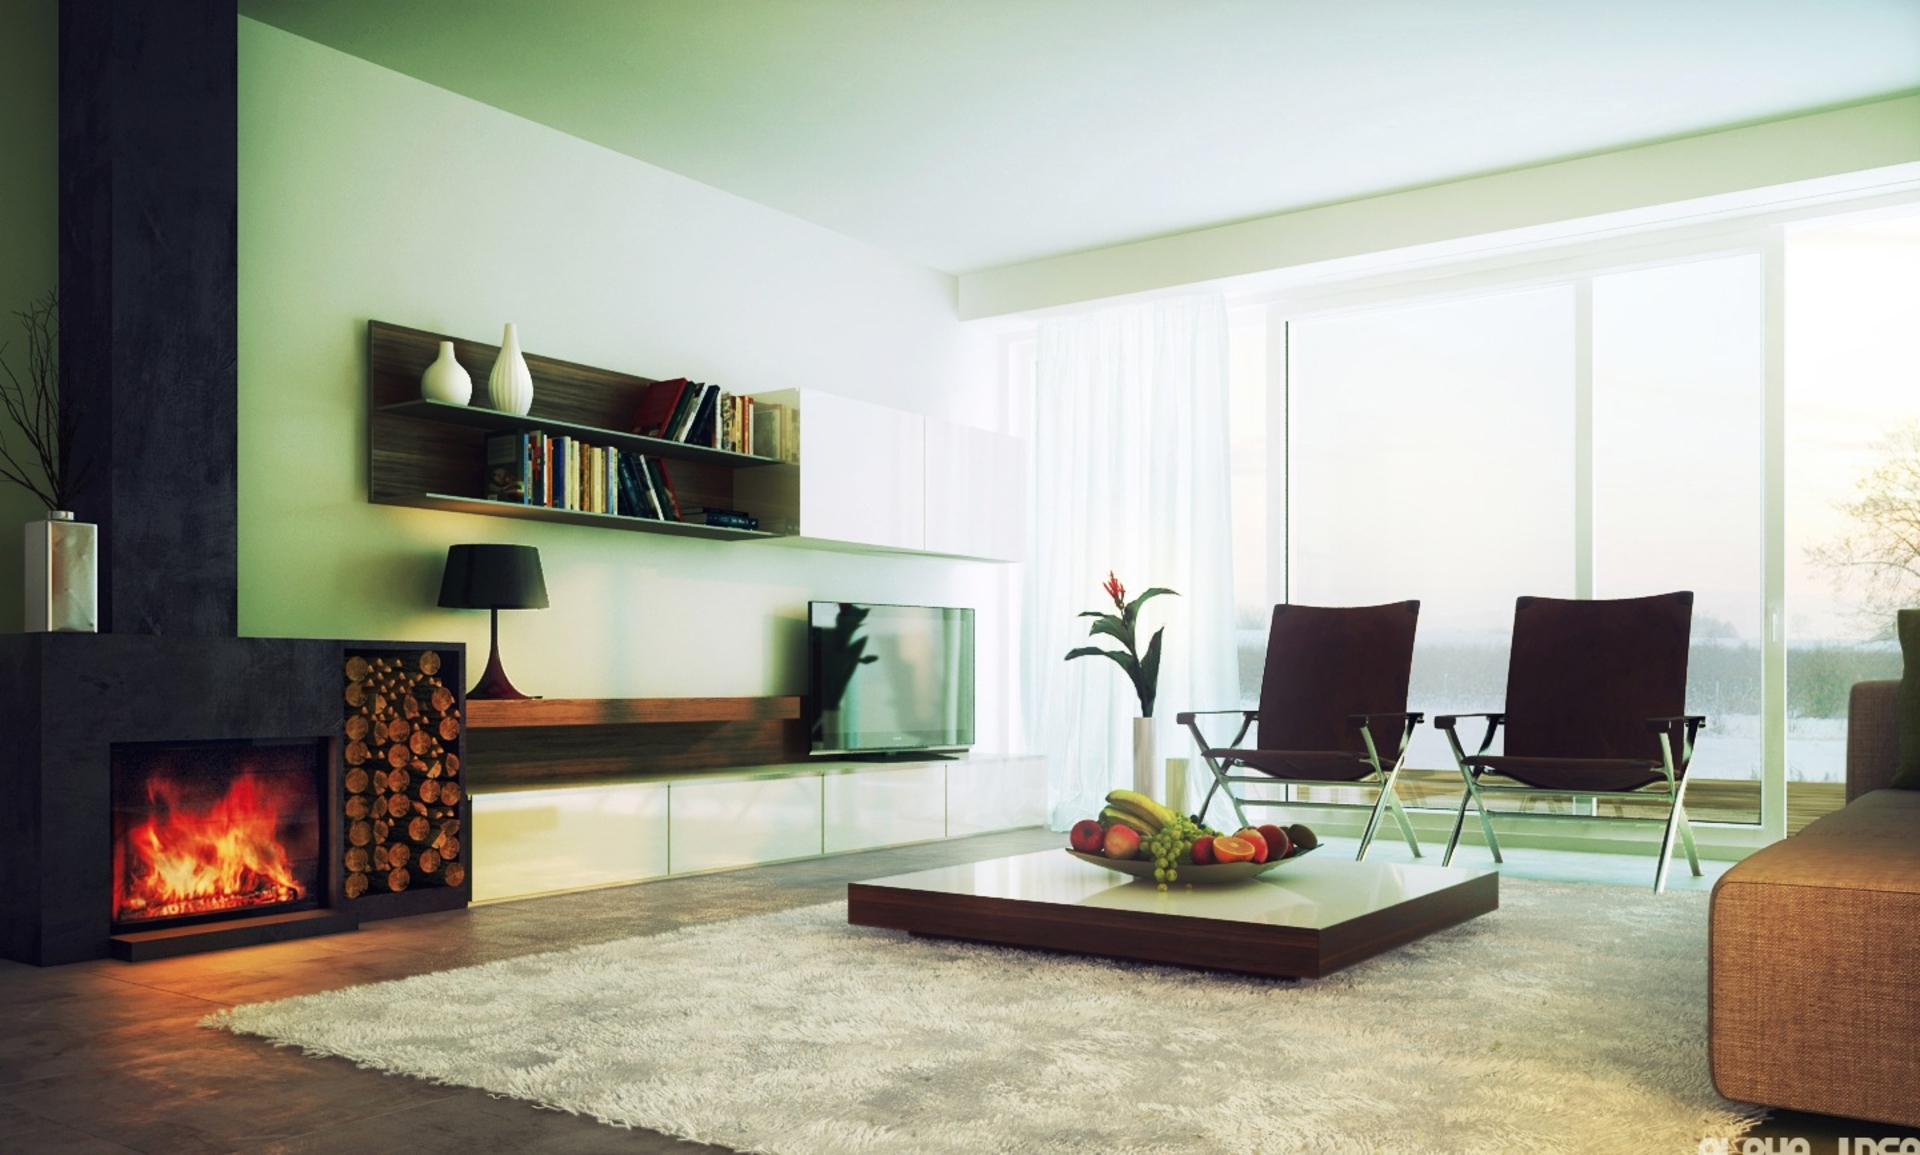 Cuatro ideas para interiores modernos  Decoracion de